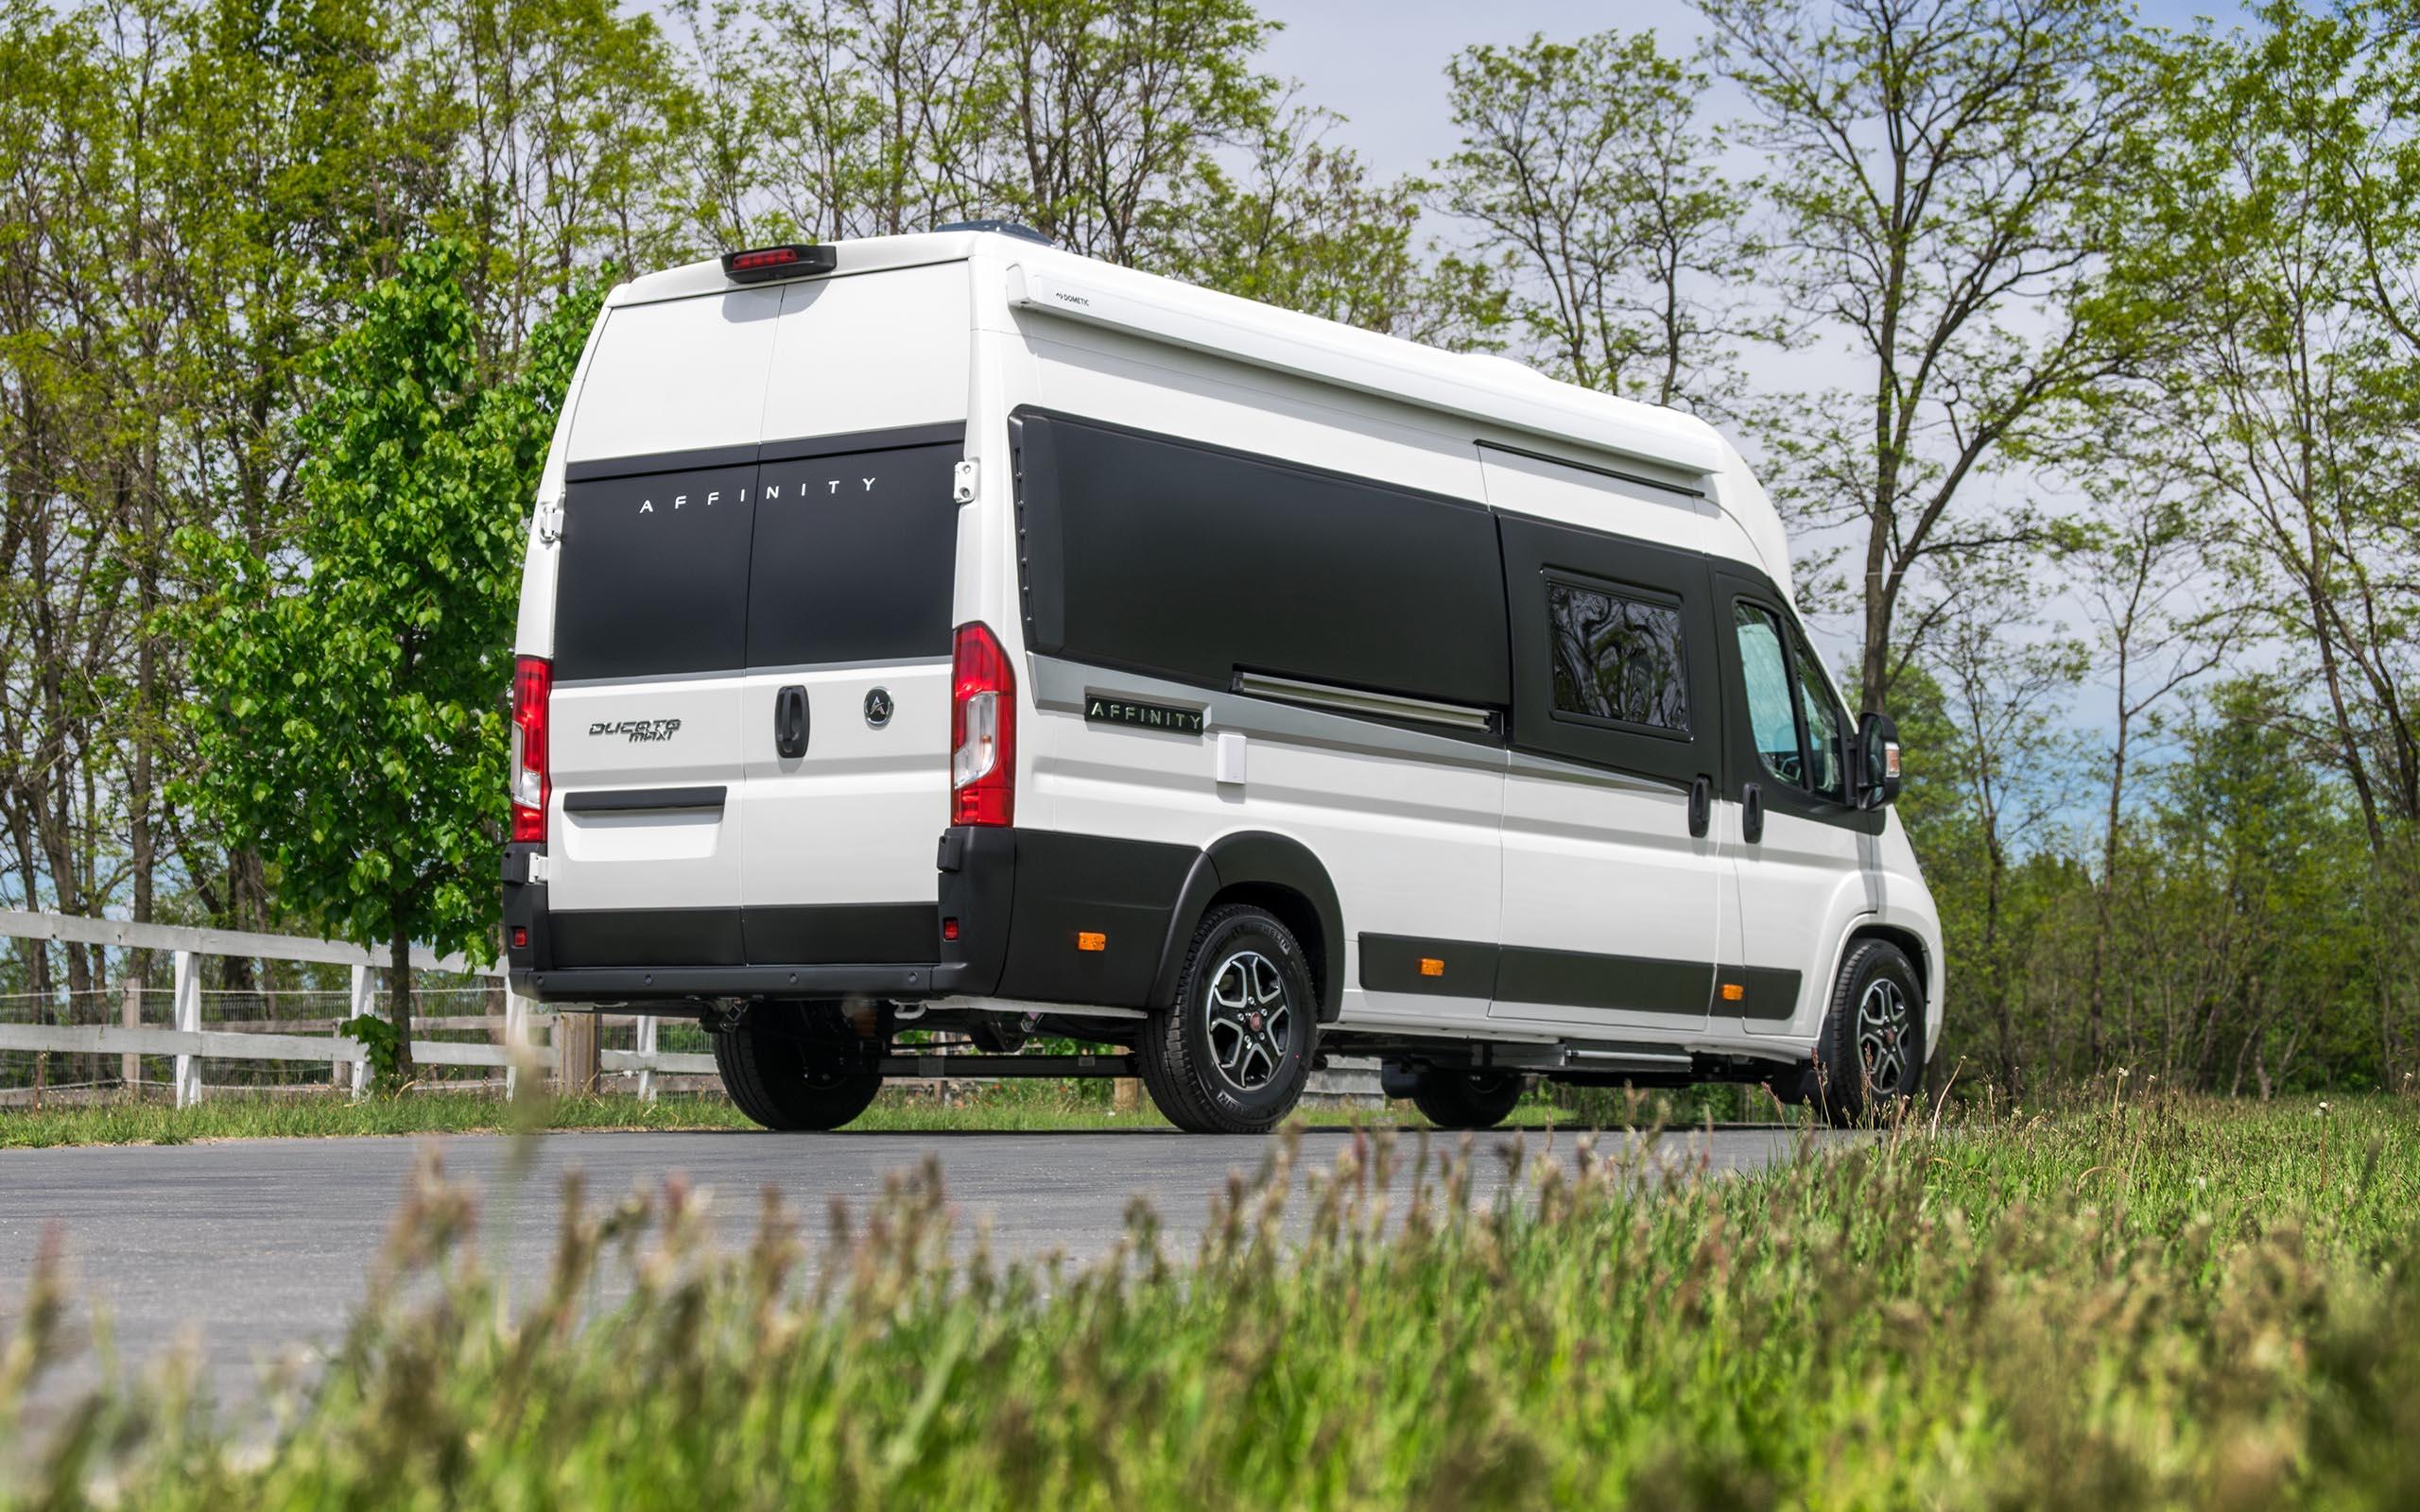 Affinity Camper Van - Exterior